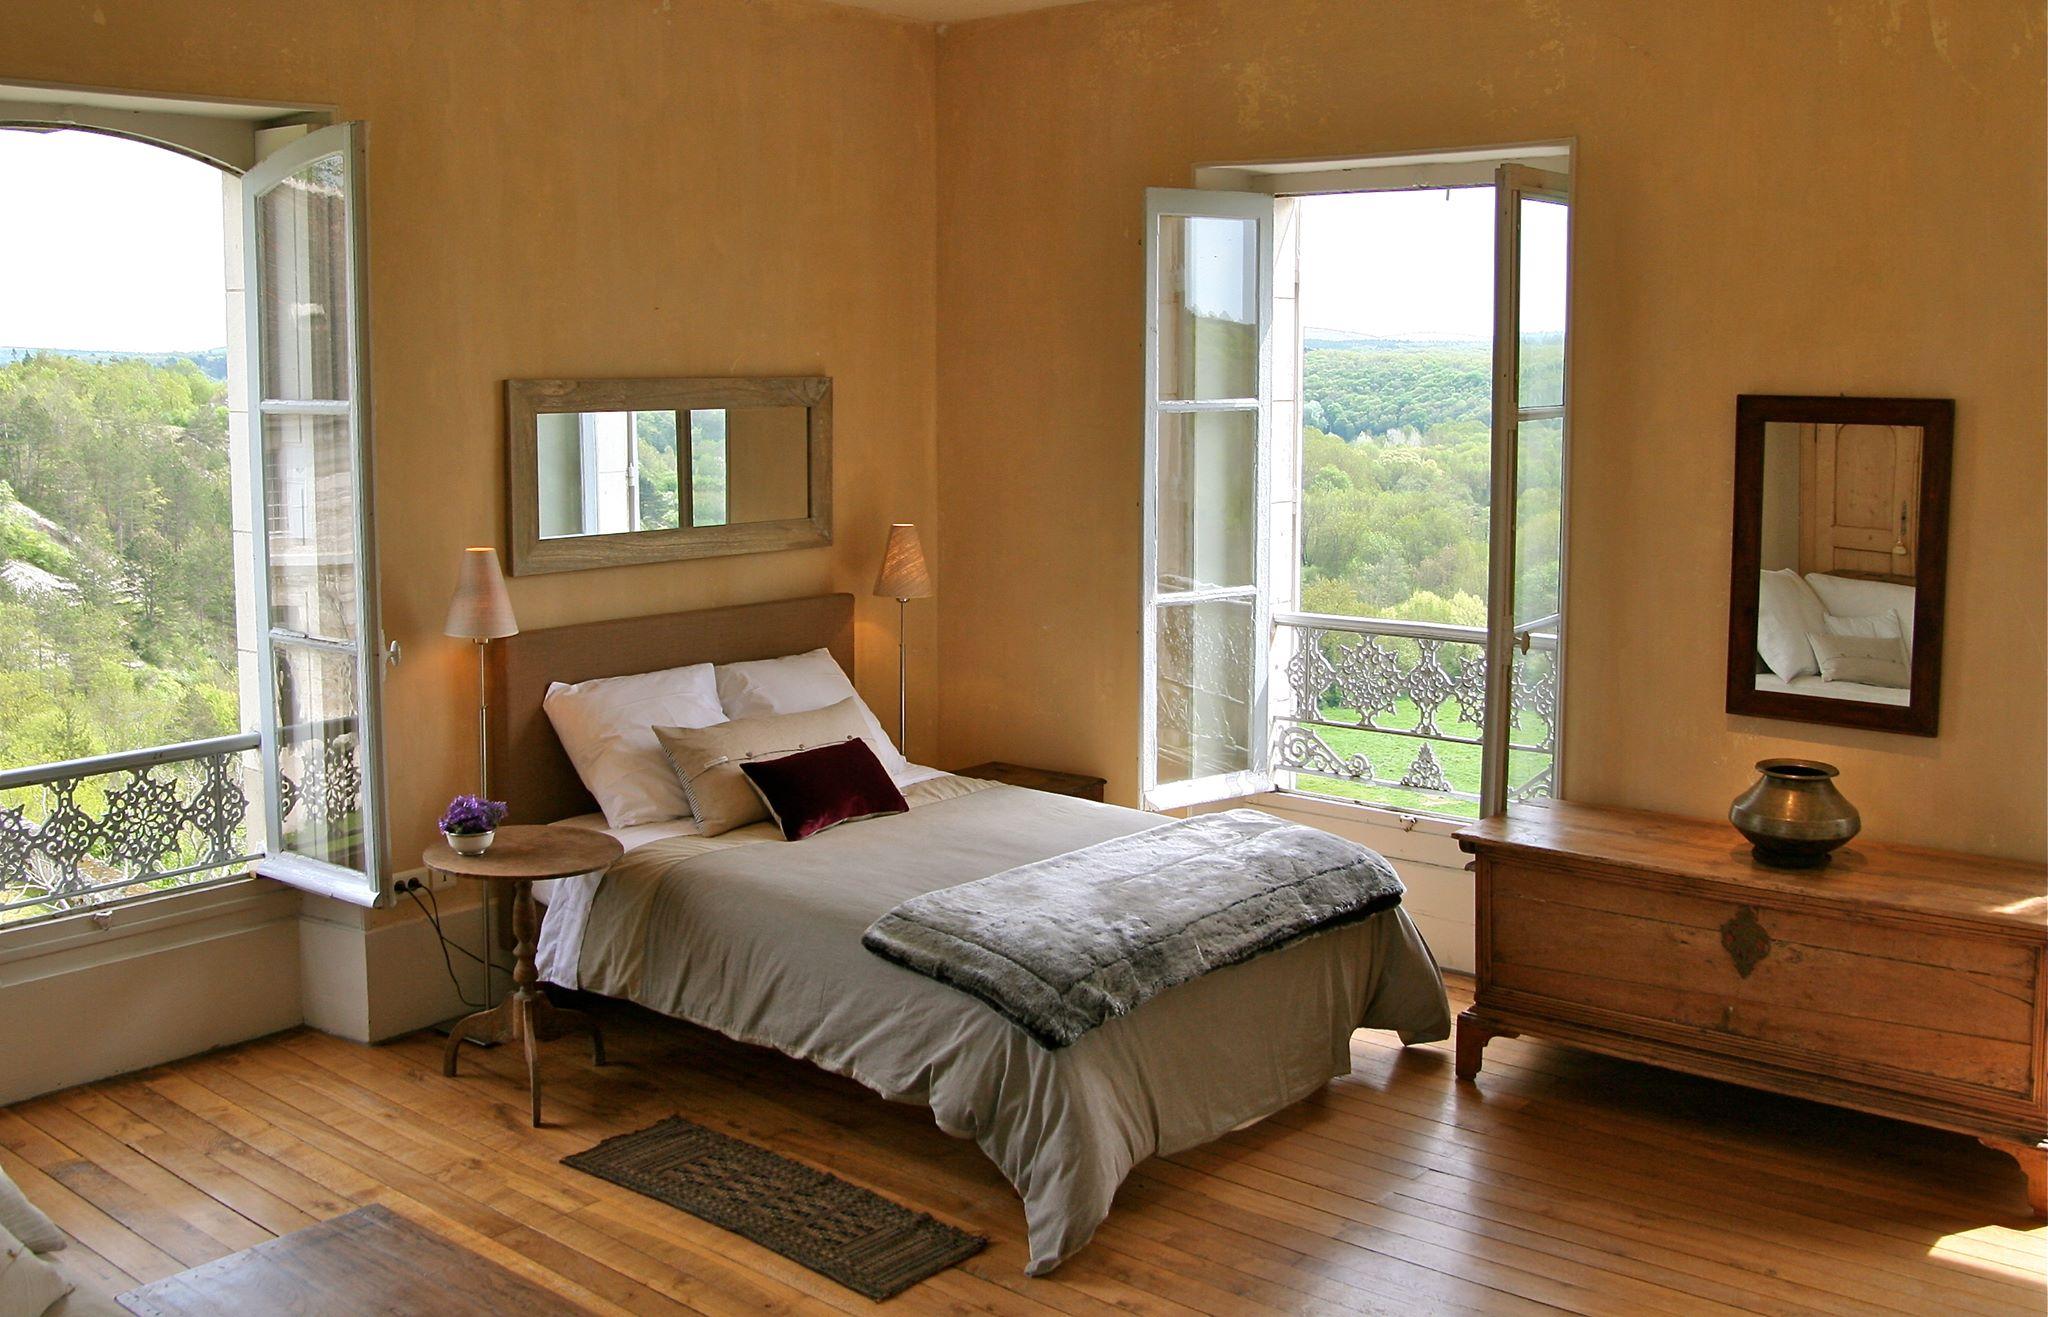 cornerbedroom.jpg